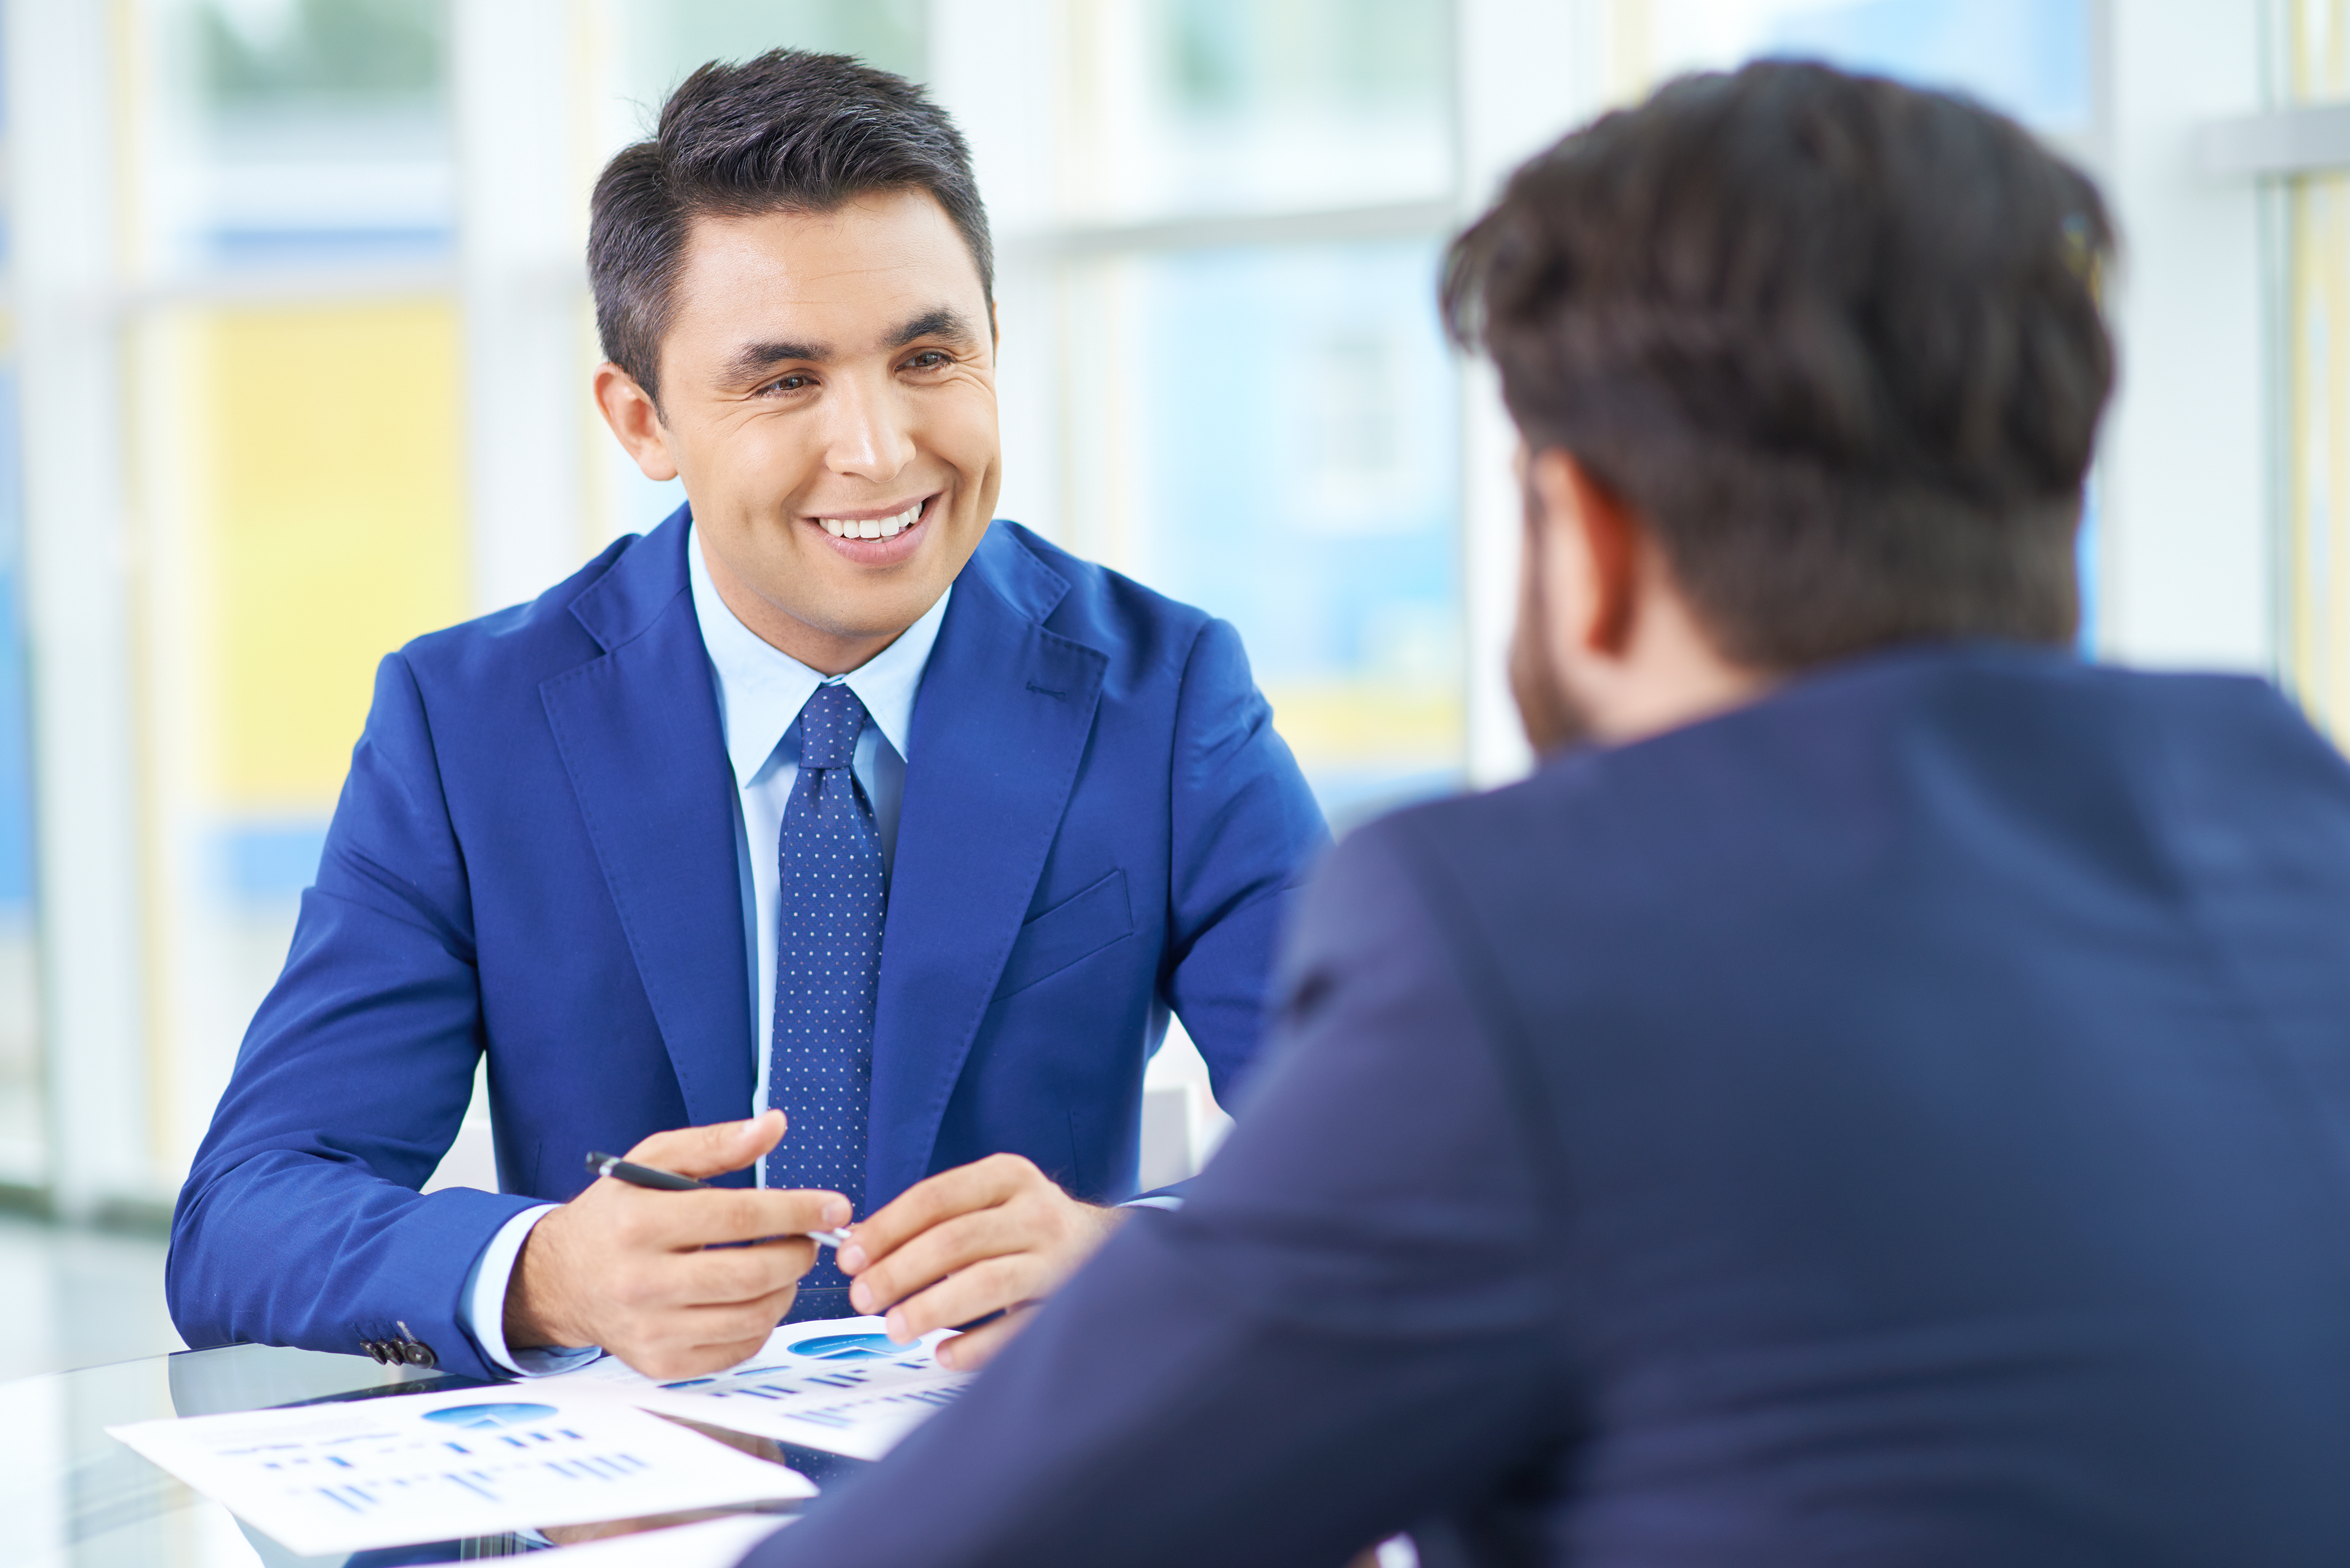 8 Tips Wawancara Calon Karyawan di Perusahaan